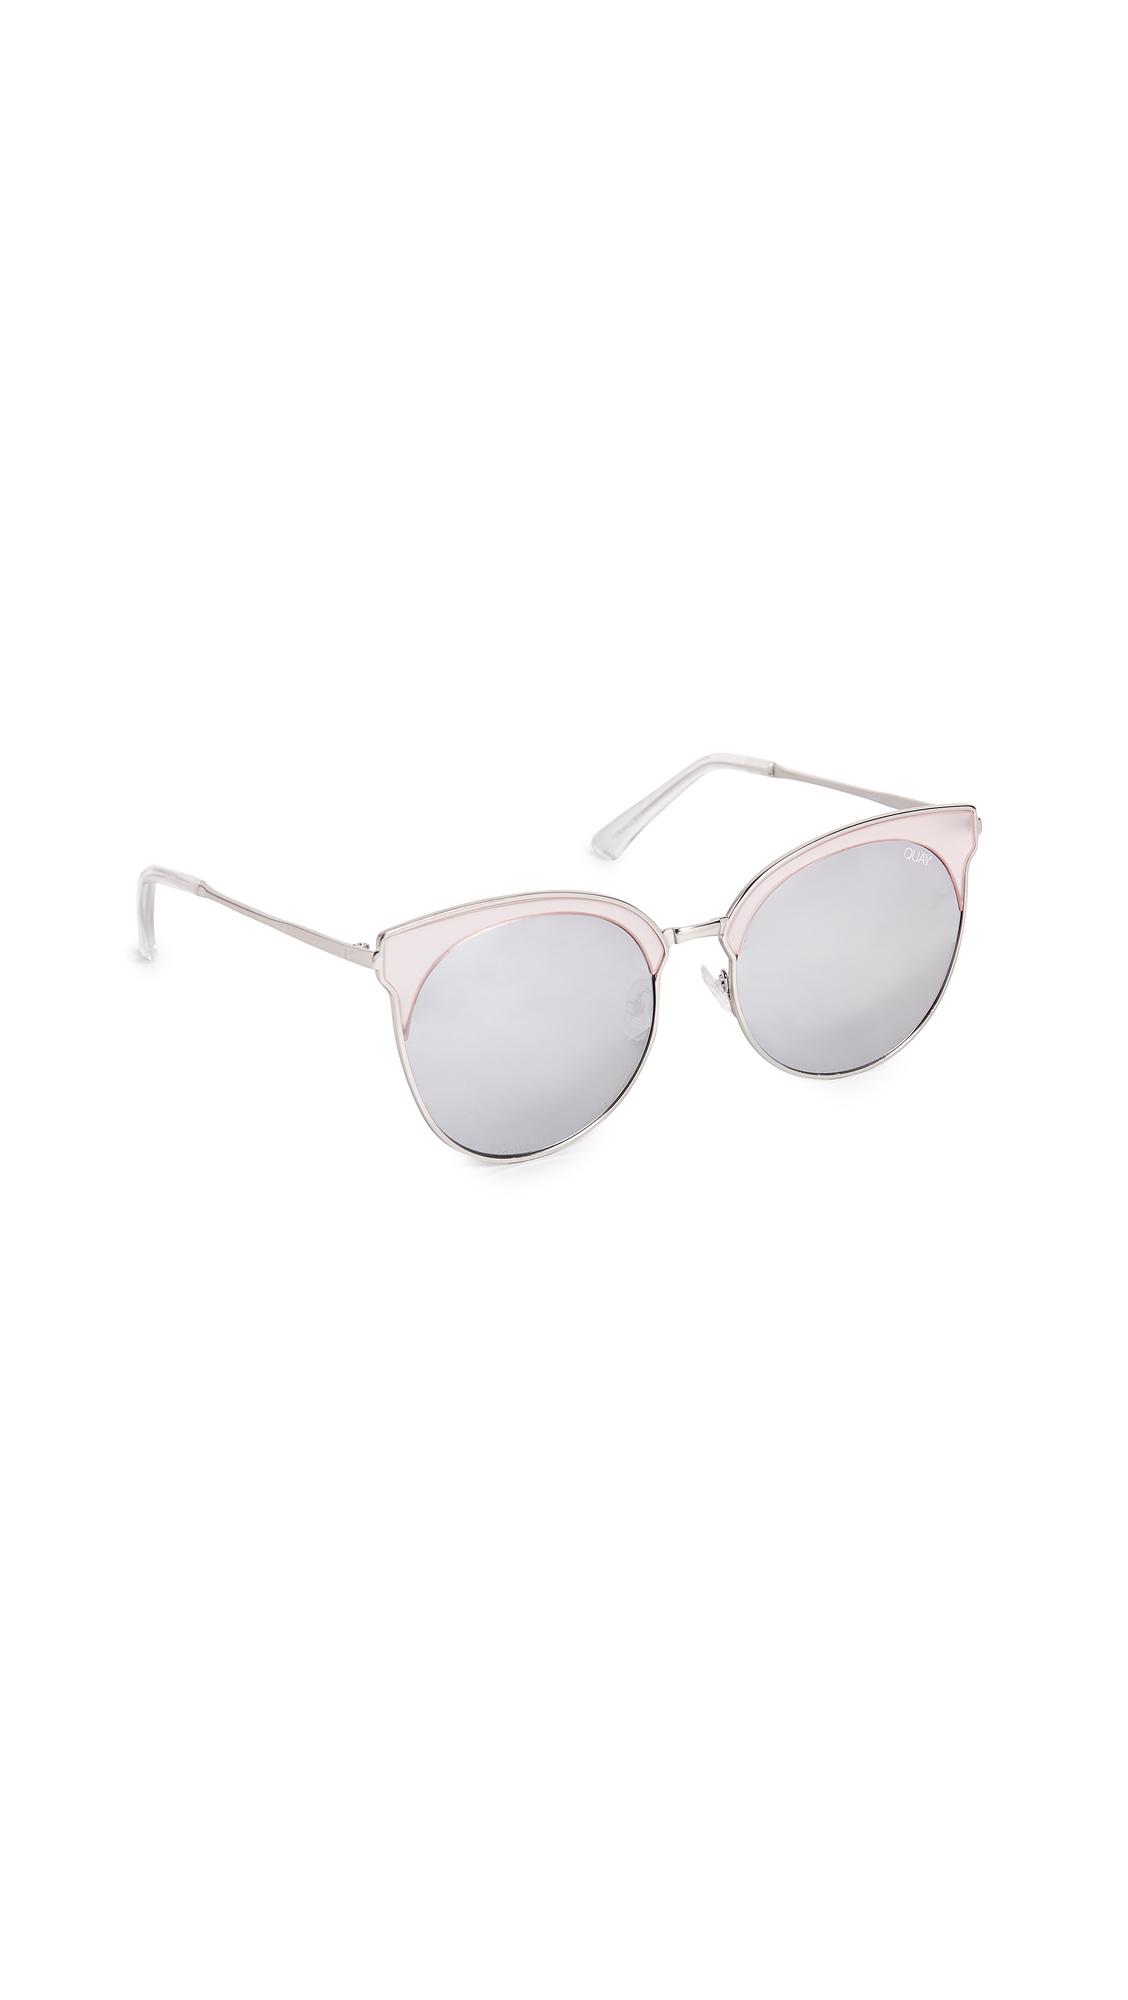 bb4d3956f5 Quay Mia Bella Sunglasses